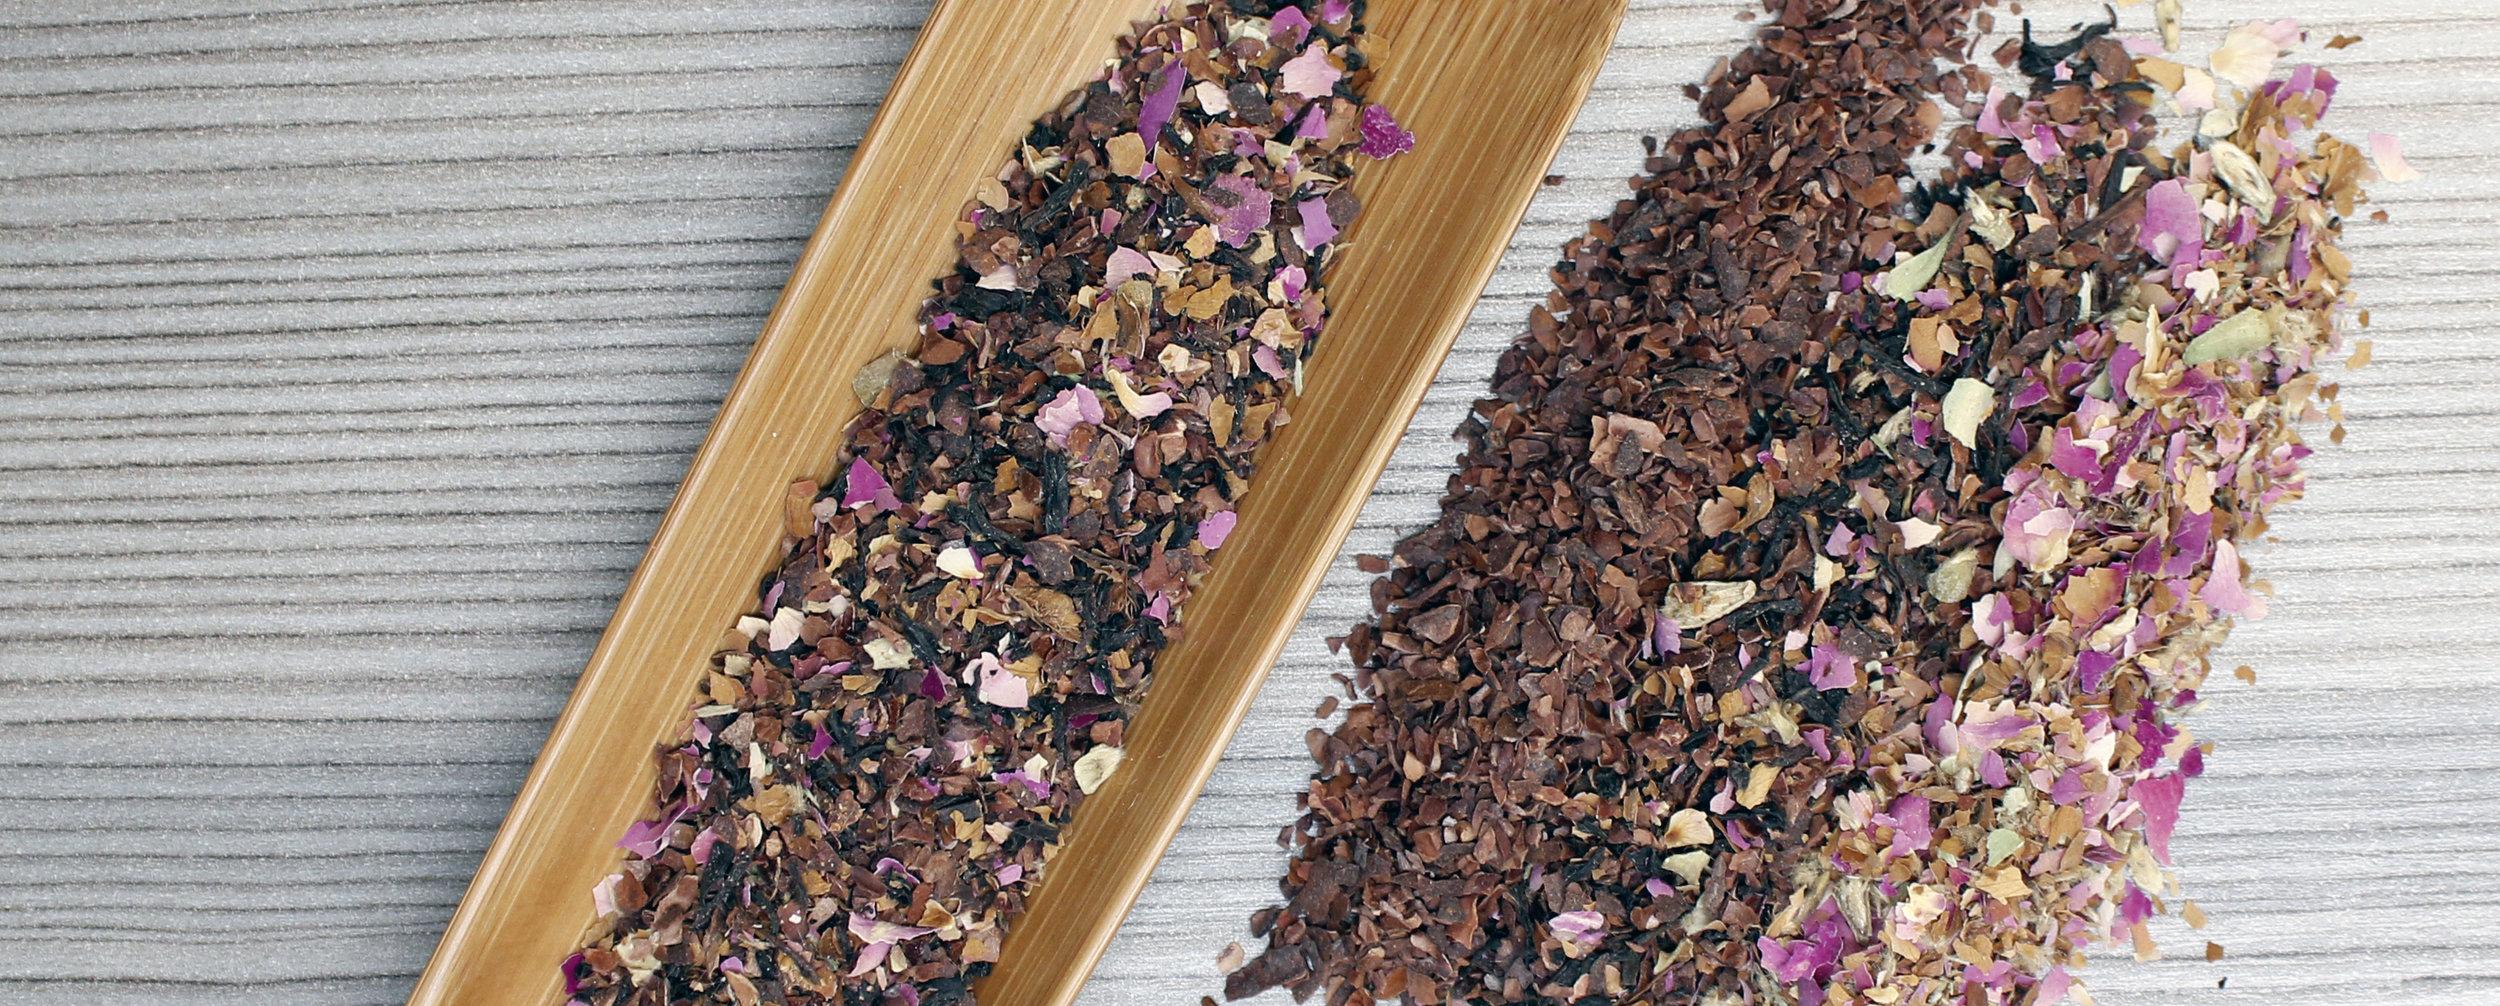 Black - Rose Cascarilla - Image.jpg